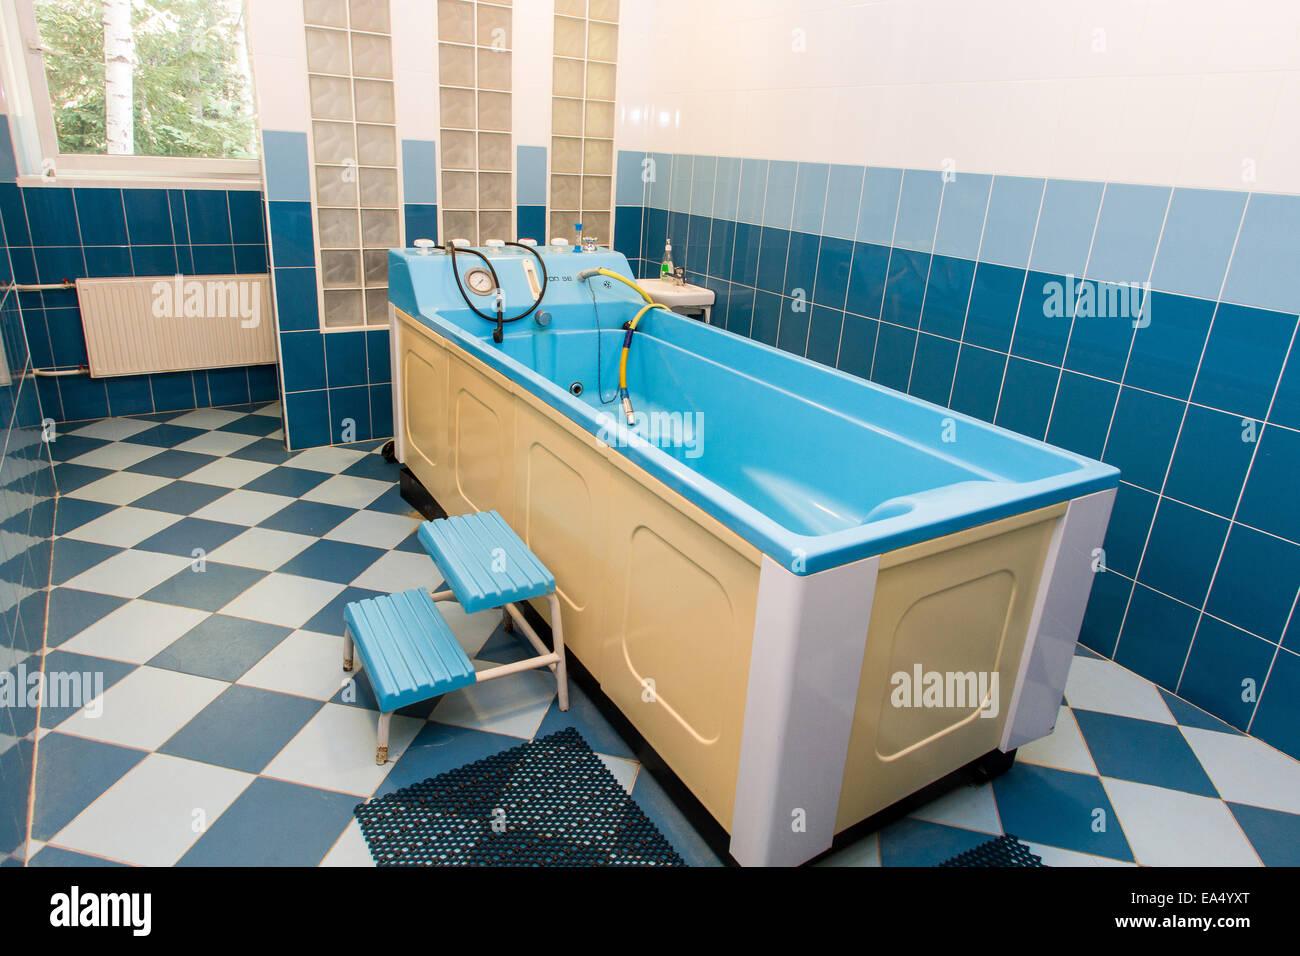 Bathtub For Water Massage Stock Photos & Bathtub For Water Massage ...